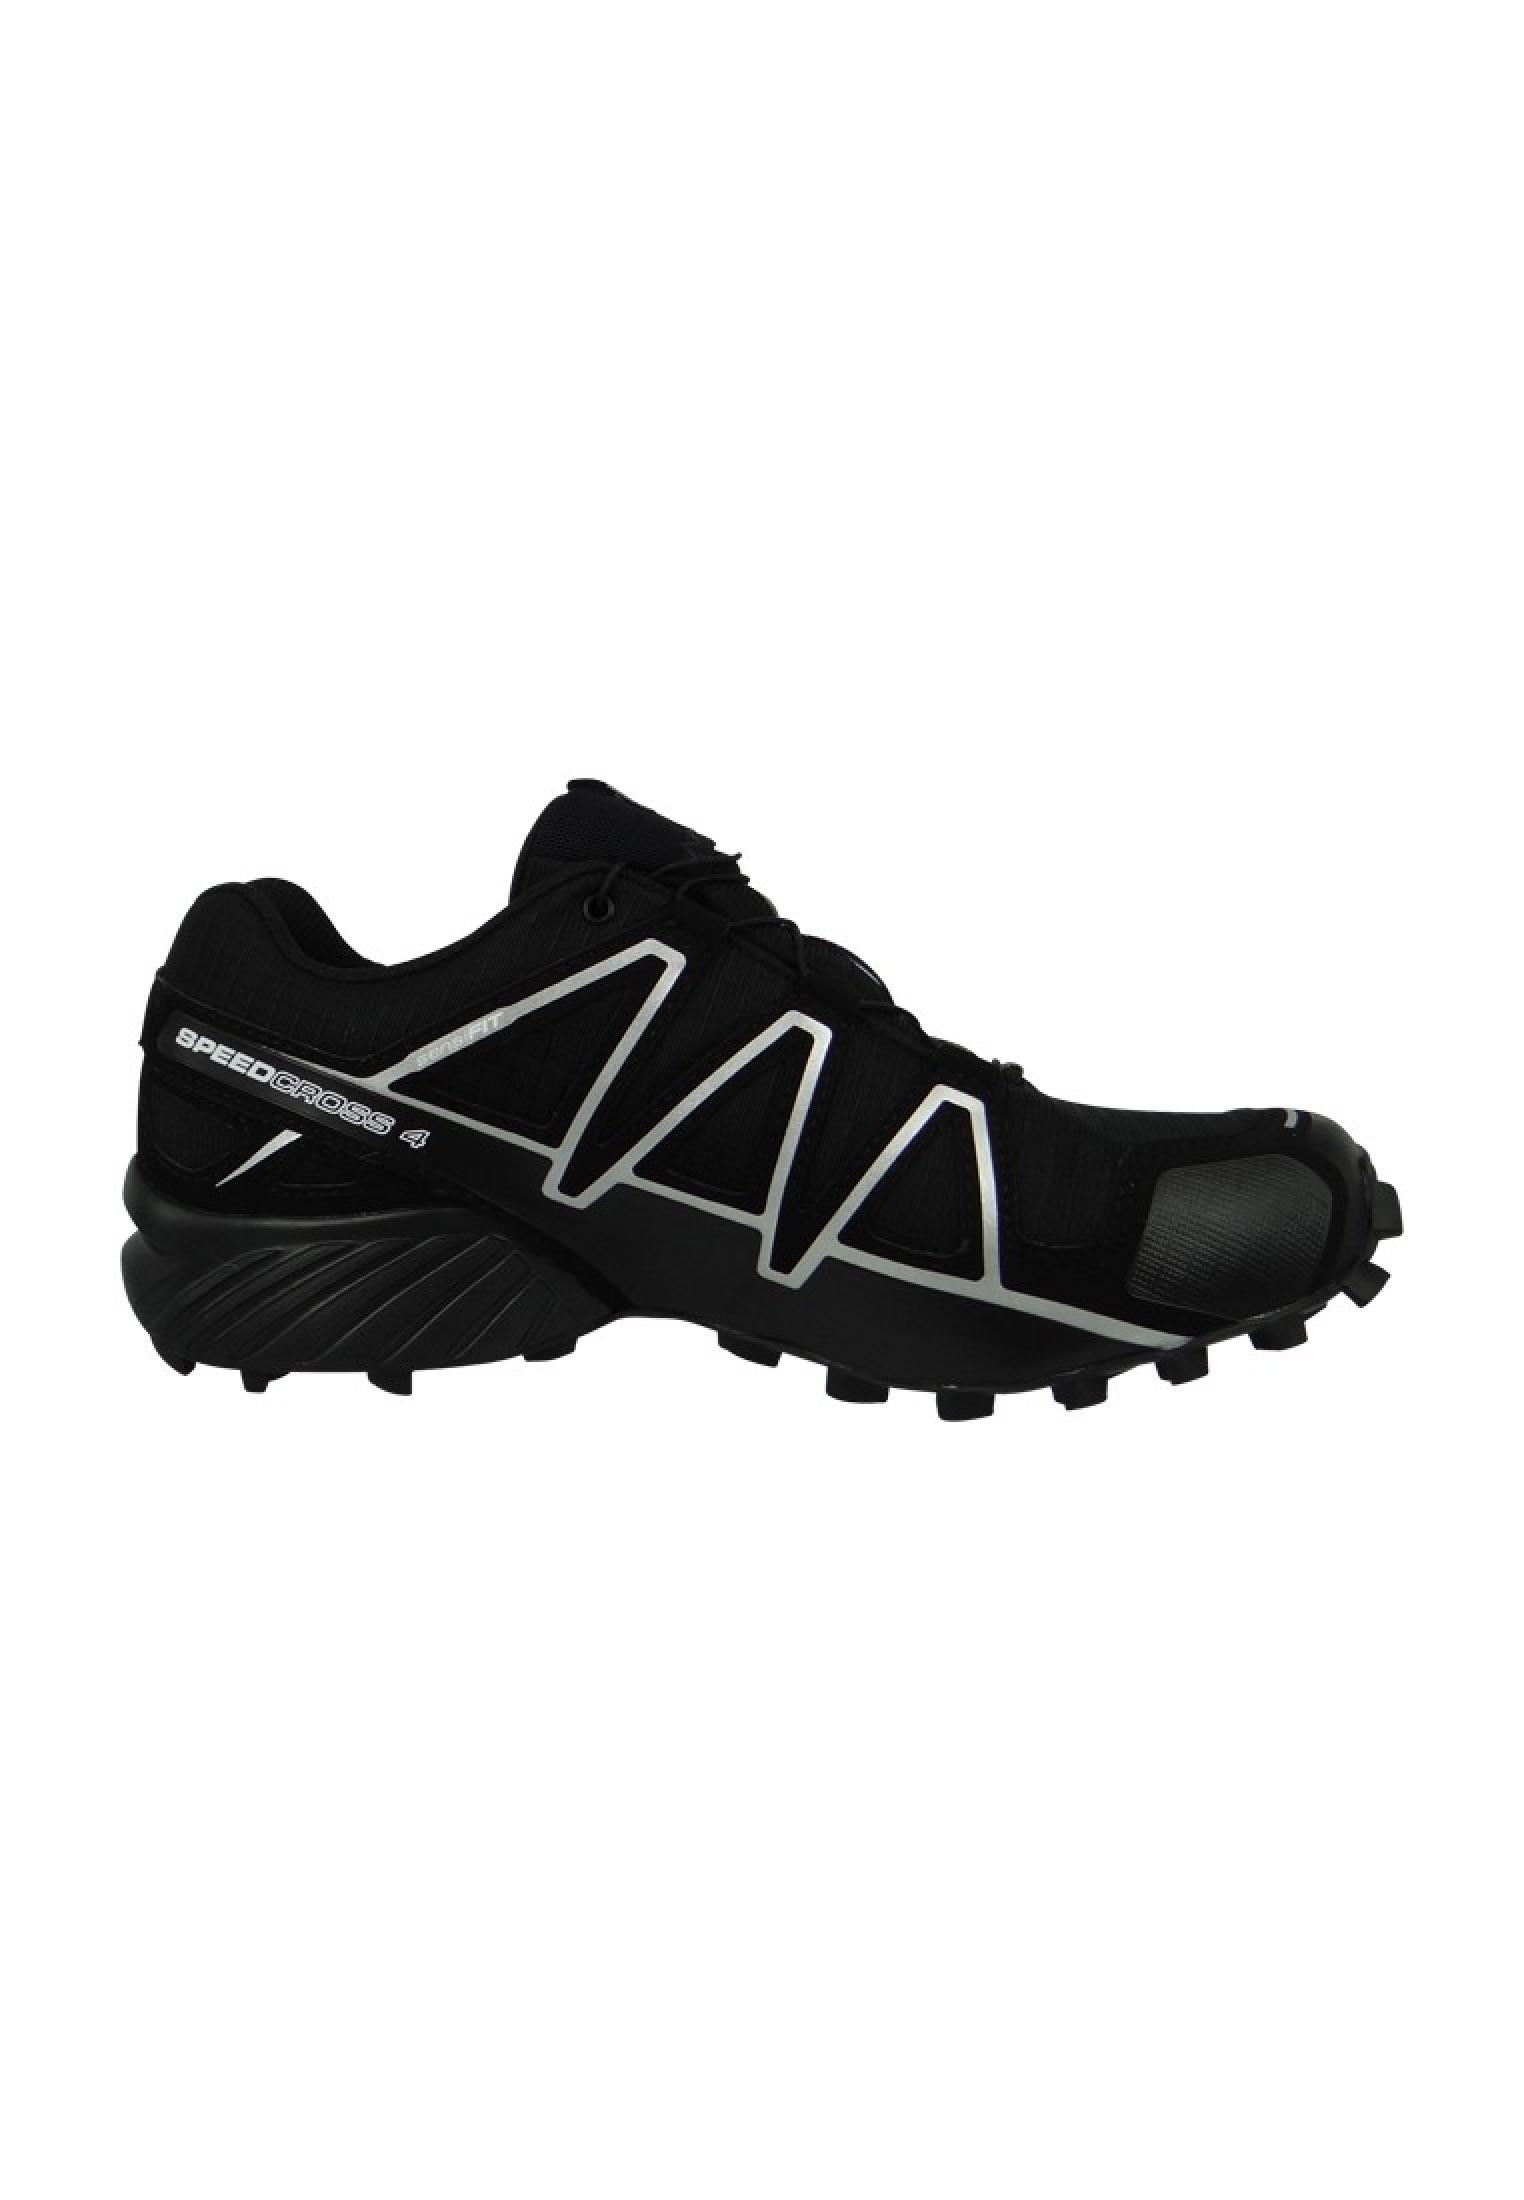 Salomon Schuhe Speedcross 4 GTX Laufschuhe 383181 Trail Schwarz Black Black Metallic